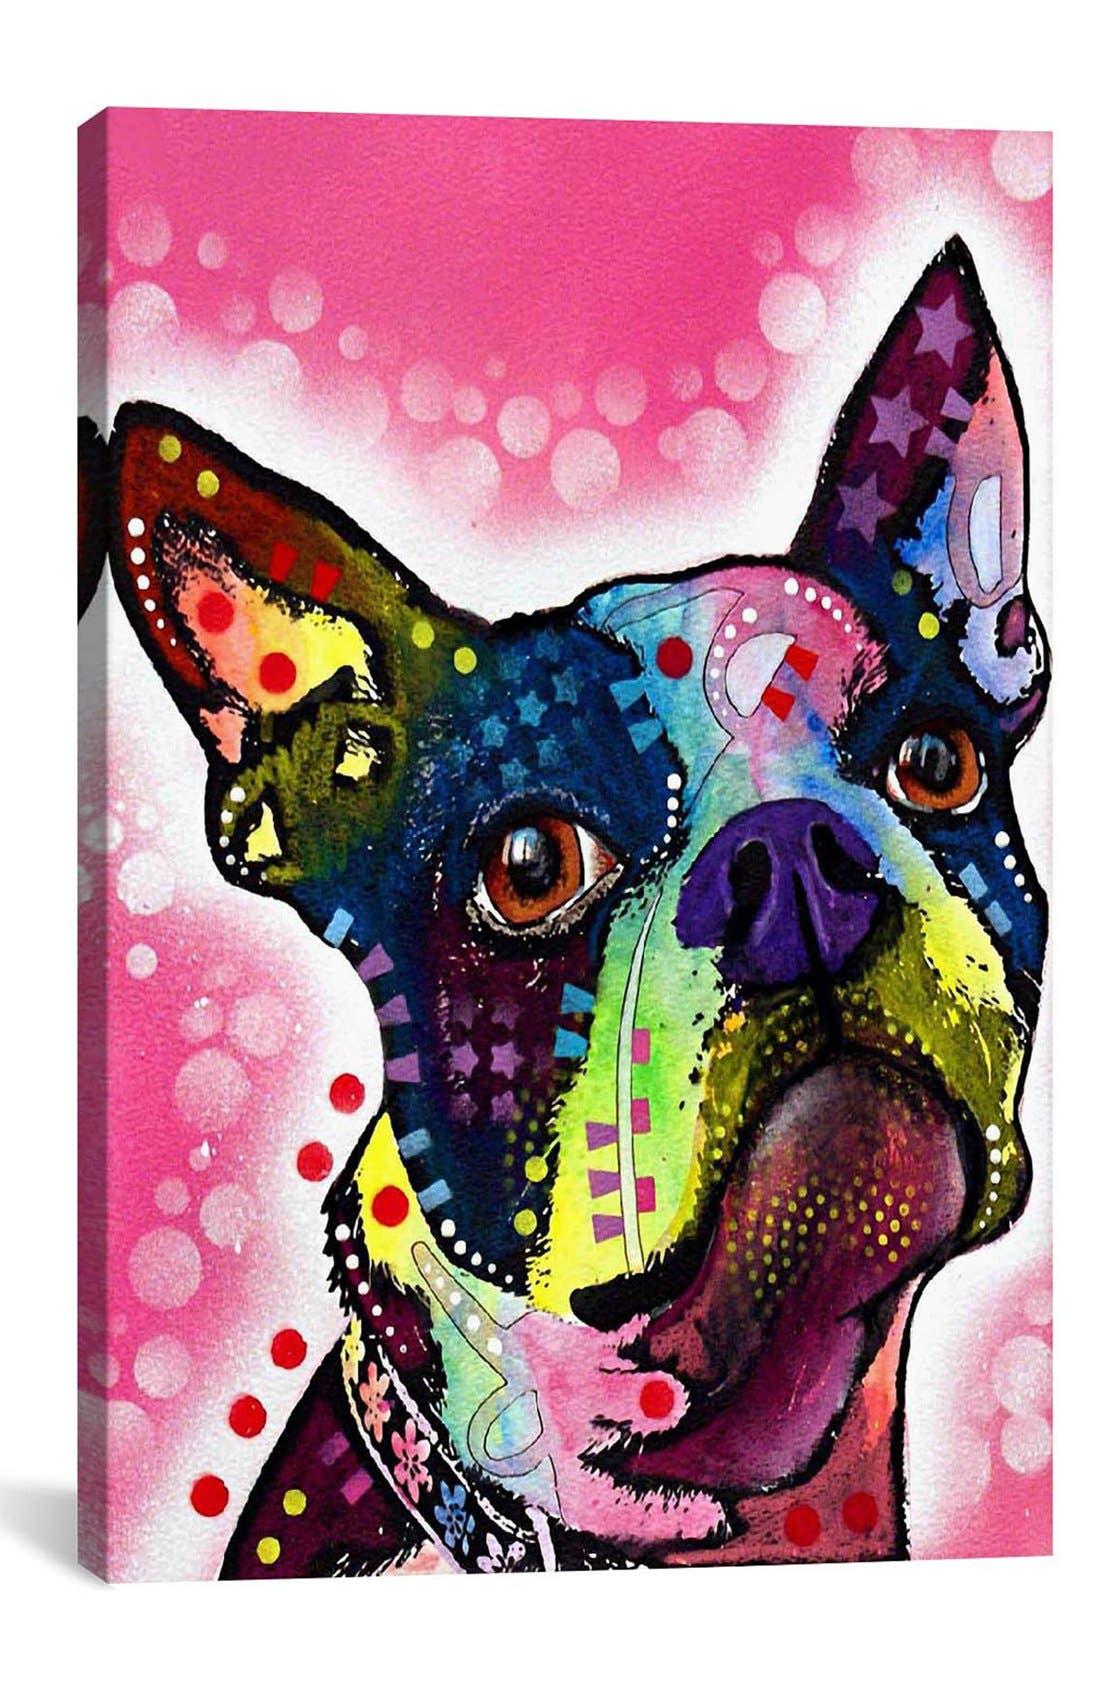 Alternate Image 1 Selected - iCanvas 'Boston Terrier - Dean Russo' Giclée Print Canvas Art